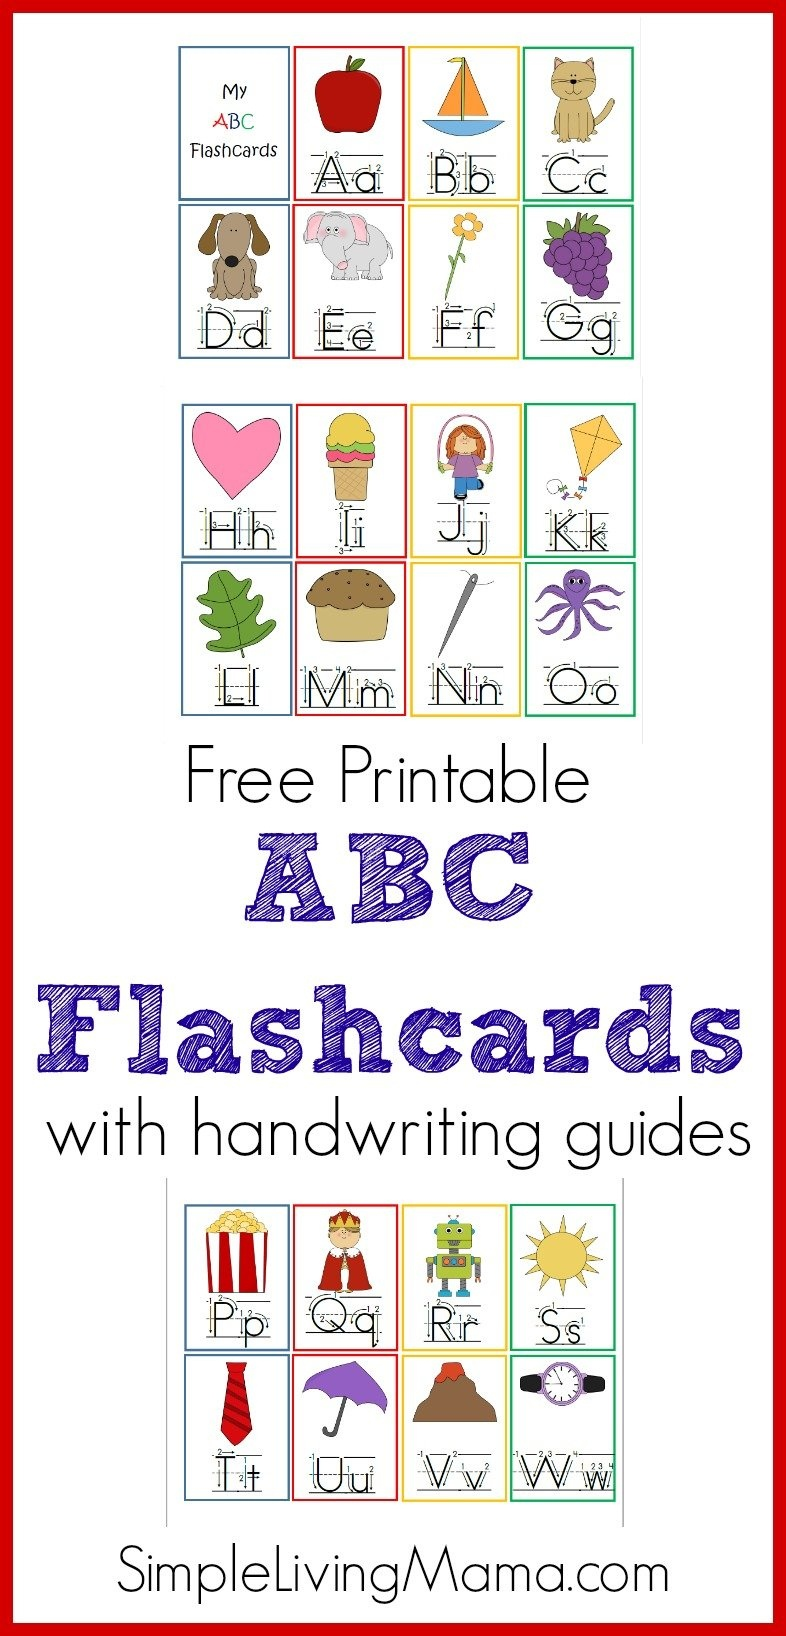 Preschool Abc Flashcards - Homeschool Printables For Free - Abc Flash Cards Free Printable